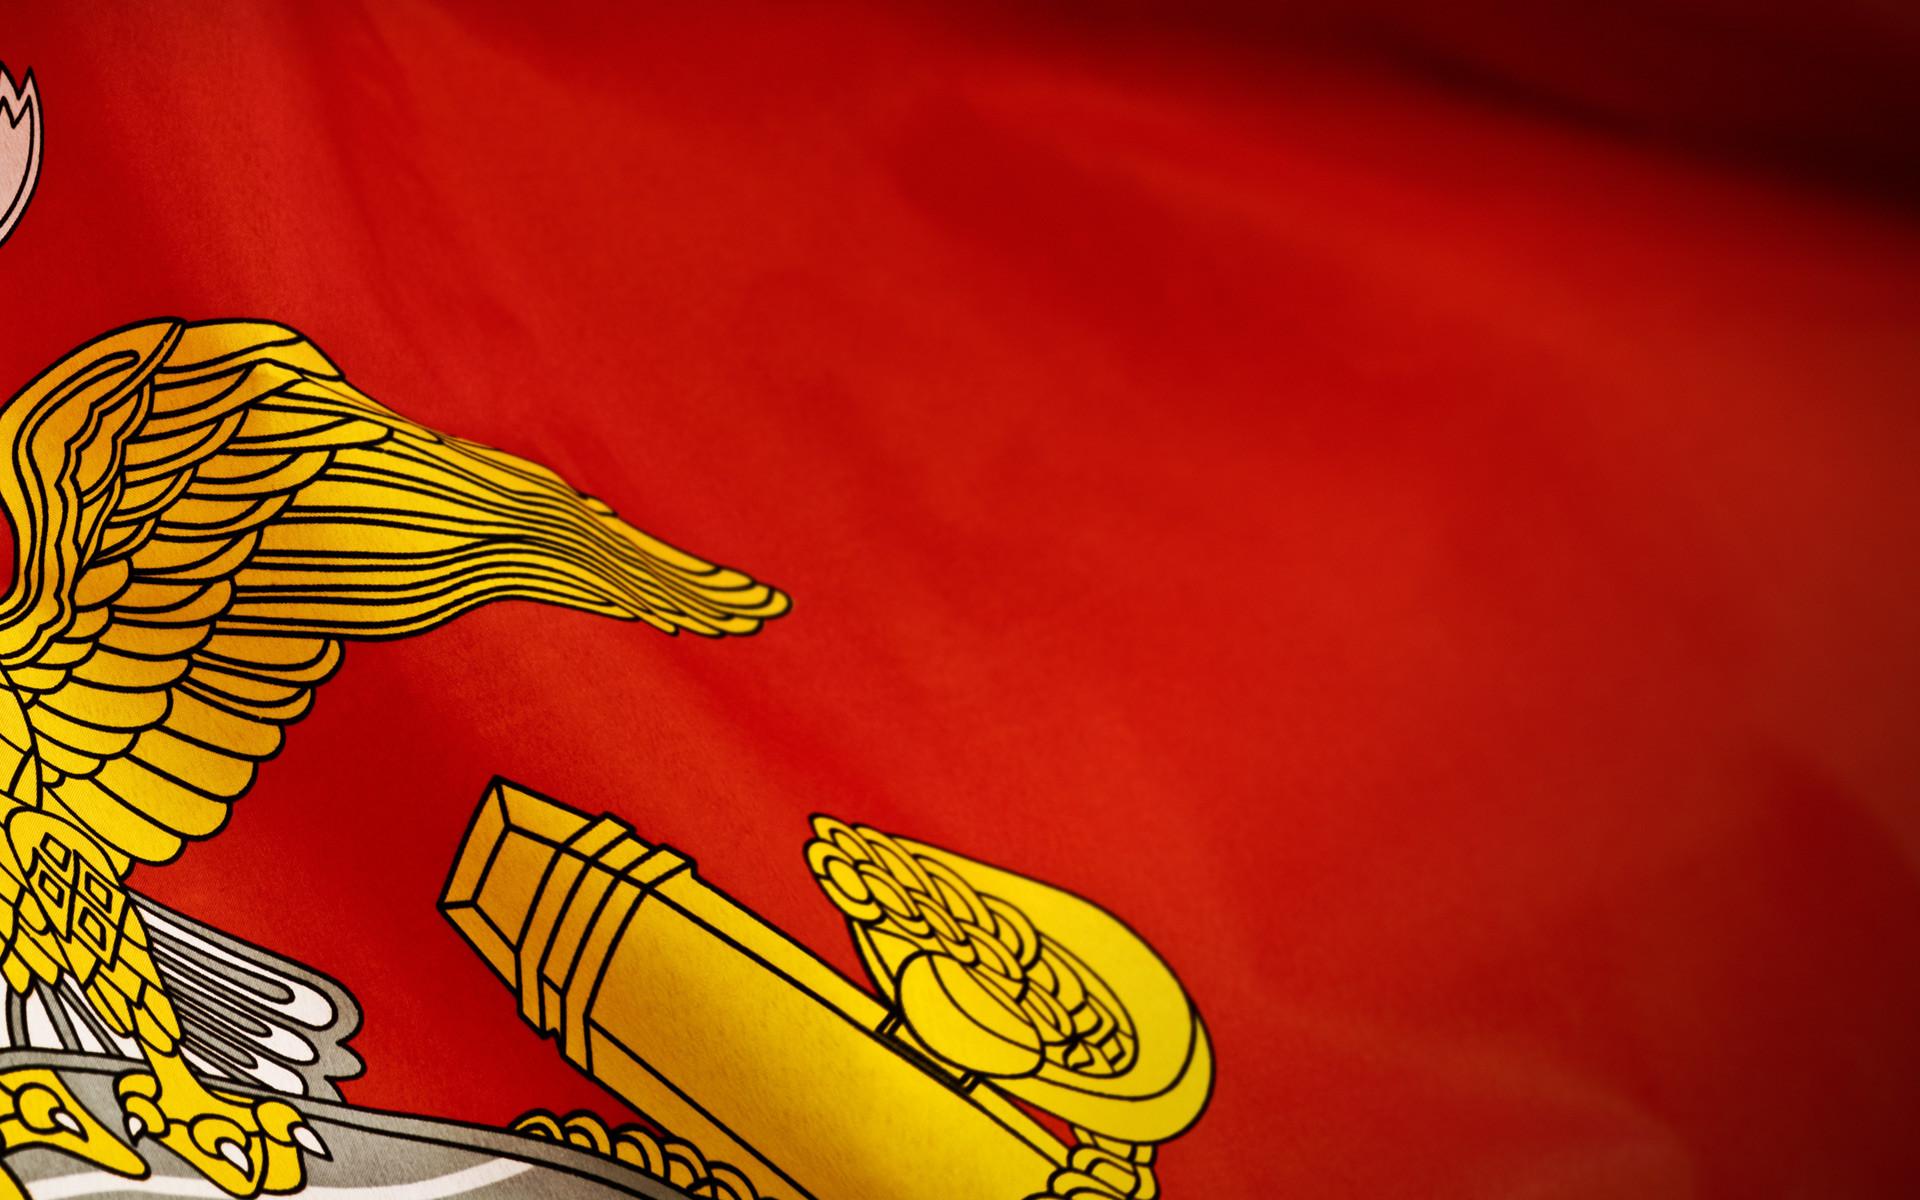 Marine Corps Wallpaper Computer #9